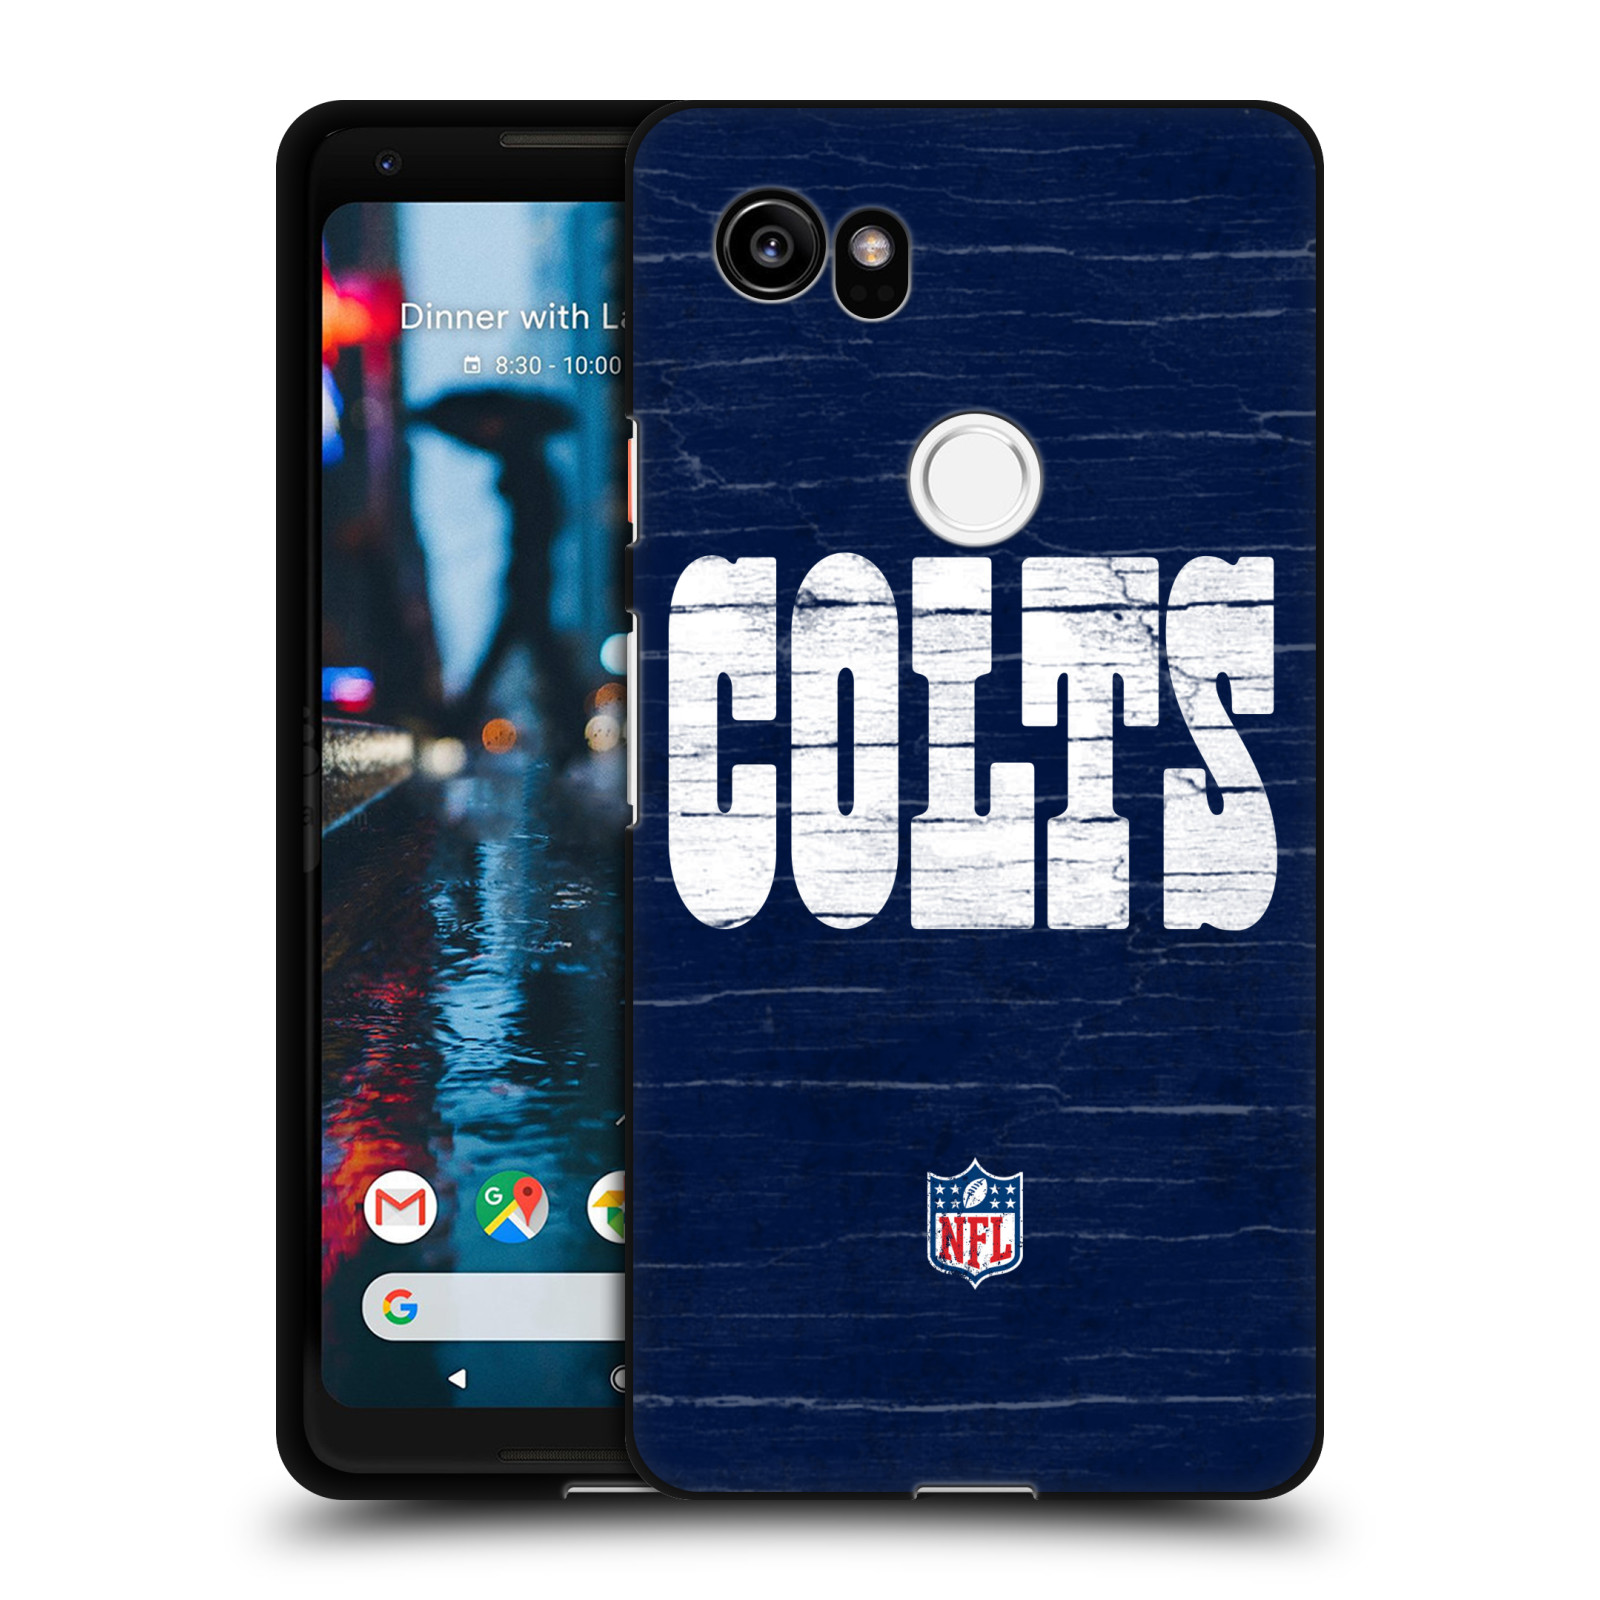 OFFICIAL-NFL-INDIANAPOLIS-COLTS-LOGO-BLACK-SOFT-GEL-CASE-FOR-GOOGLE-PHONES